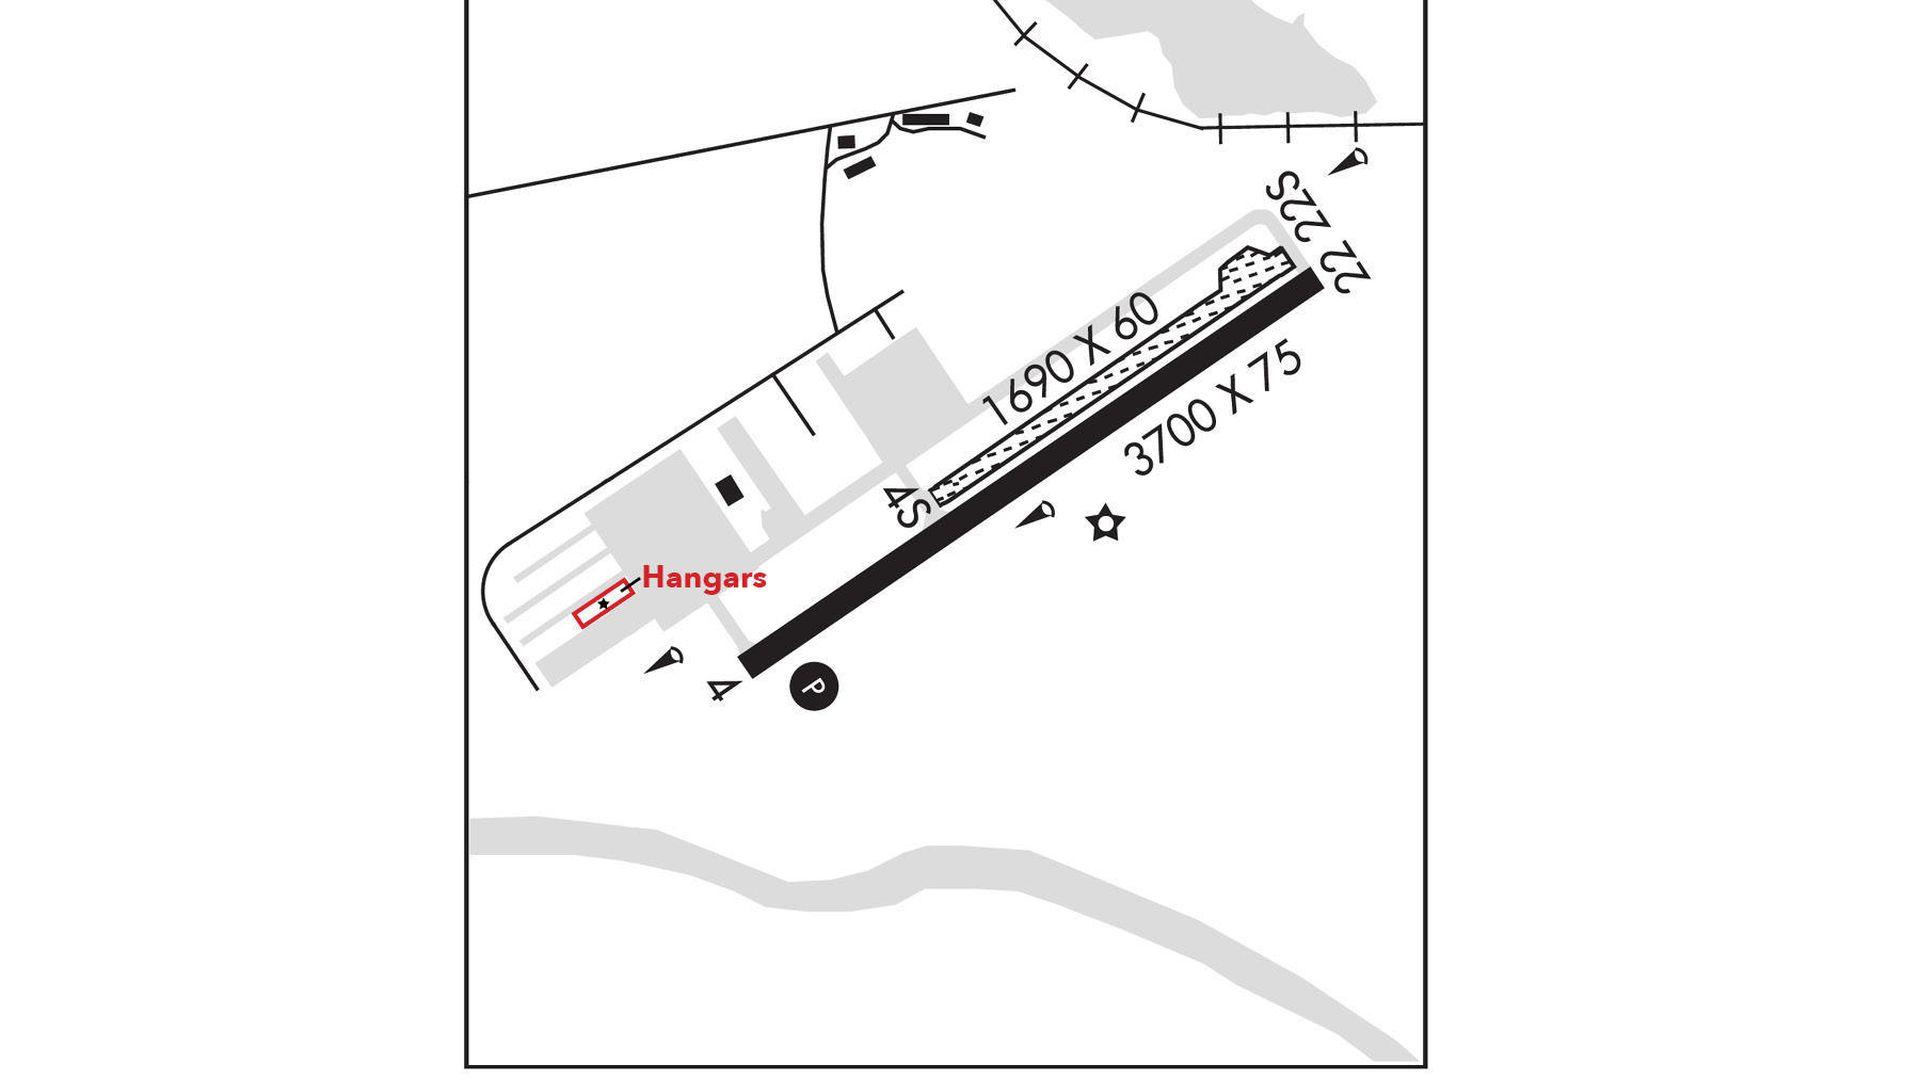 4190 Aviation Avenue, #3 Wasilla, AK 99654 United States